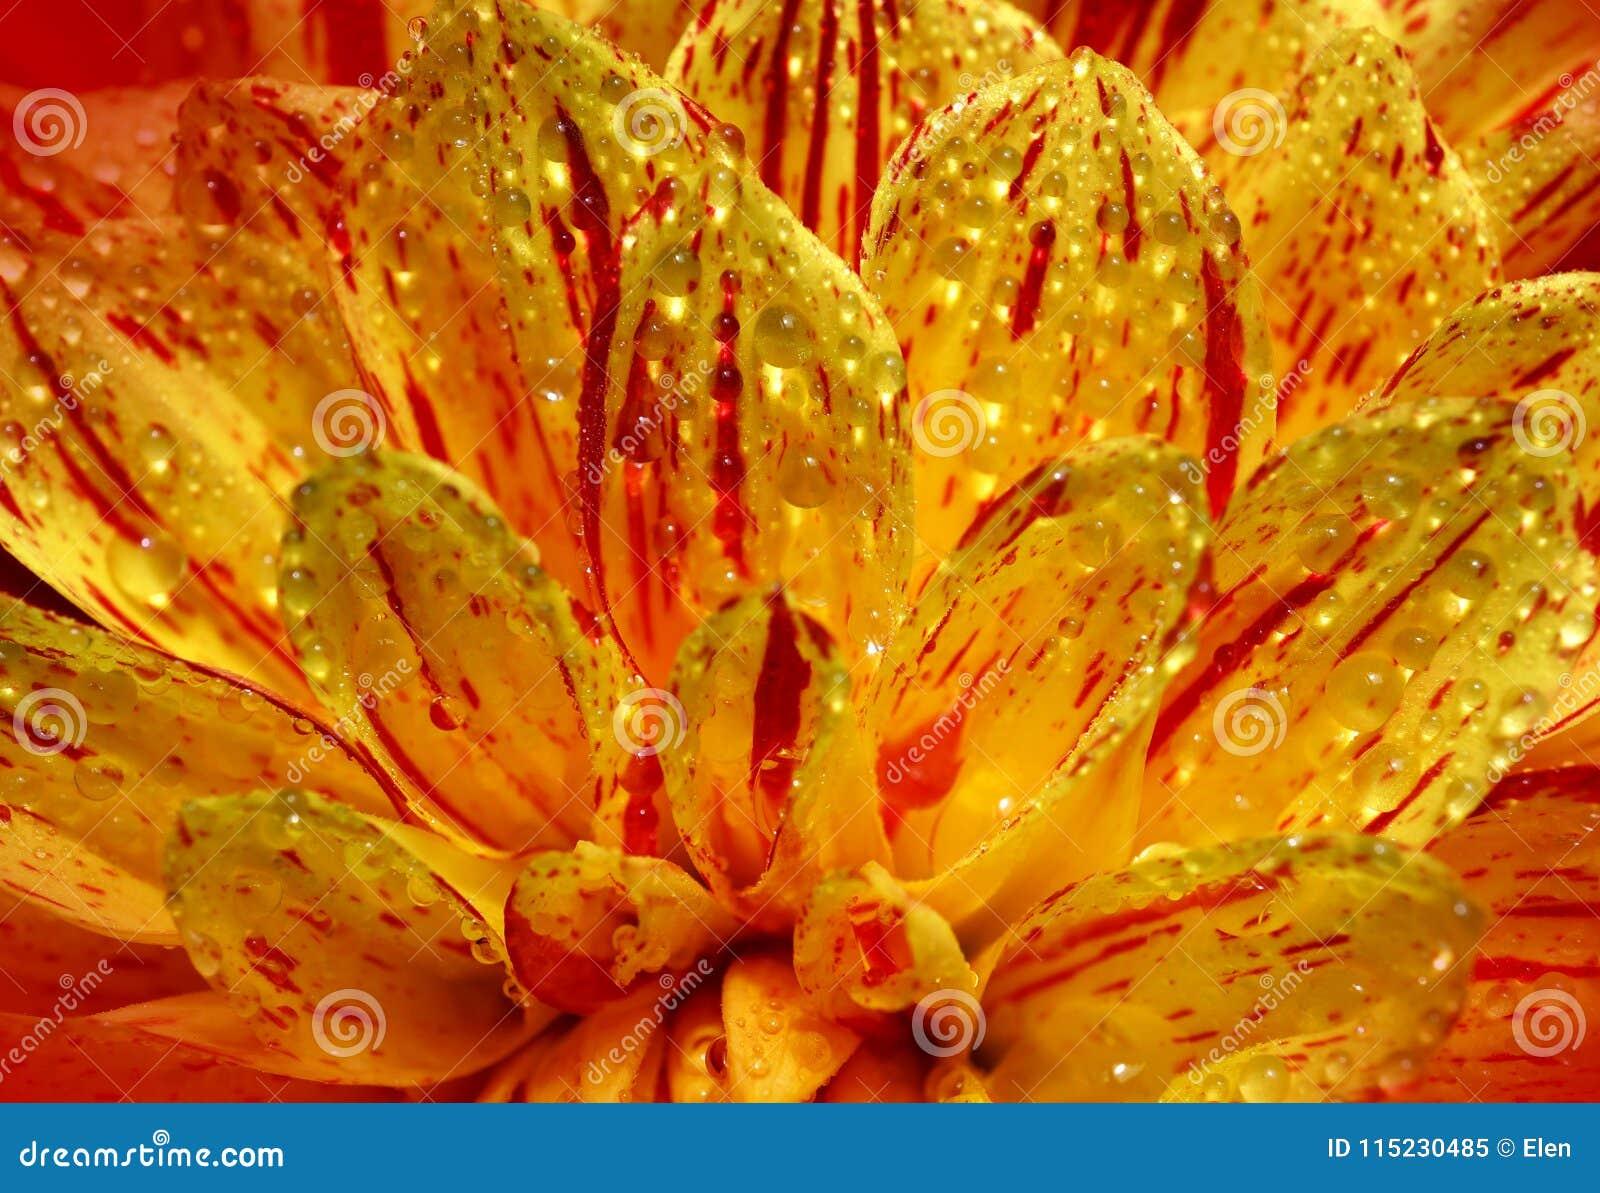 Beautiful Flower Dahlia Close Up Stock Image Image Of Glow Dahlia